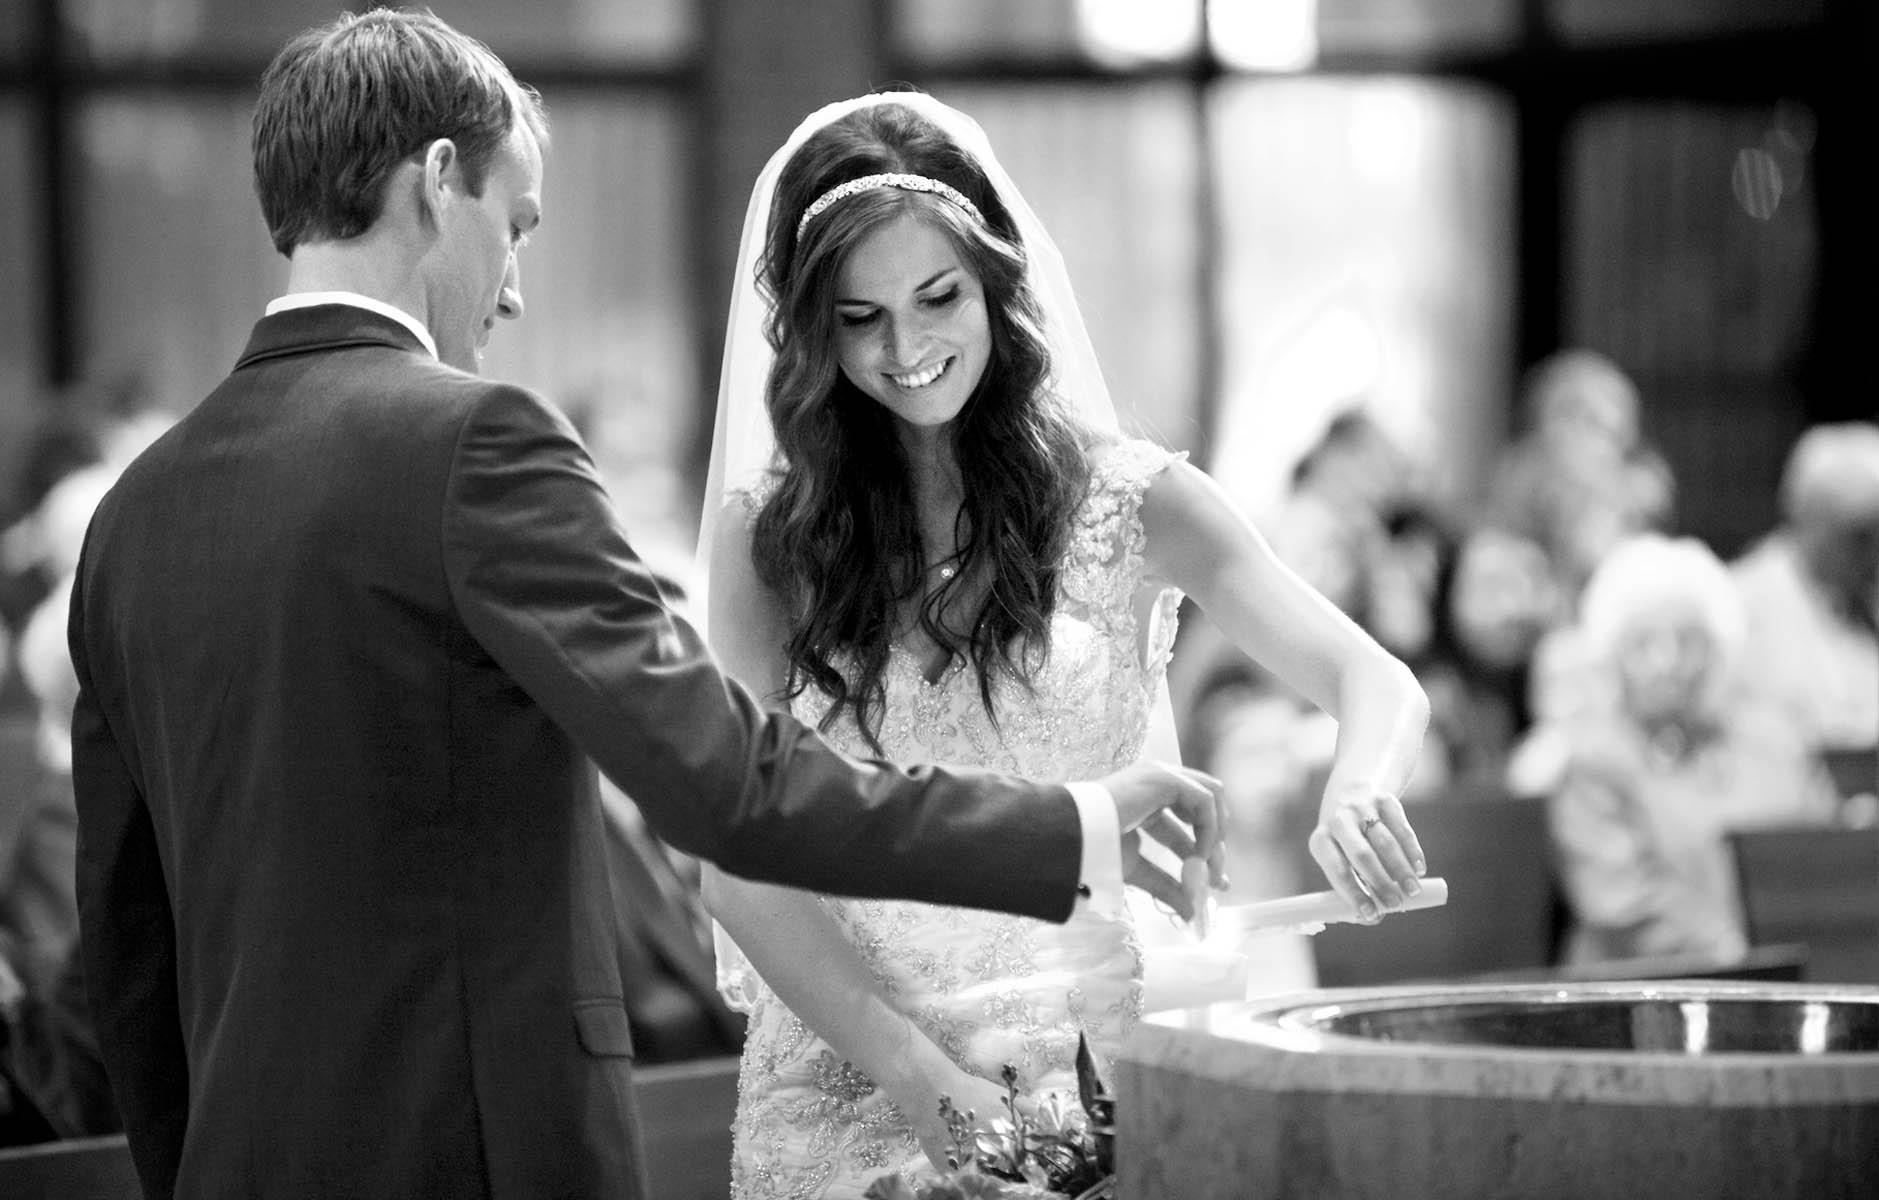 Unity candle, Alissa & Brandon ceremony at Our Saviour Catholic Church, Jacksonville. Wedding photography by Tiffany & Steve Warmowski.